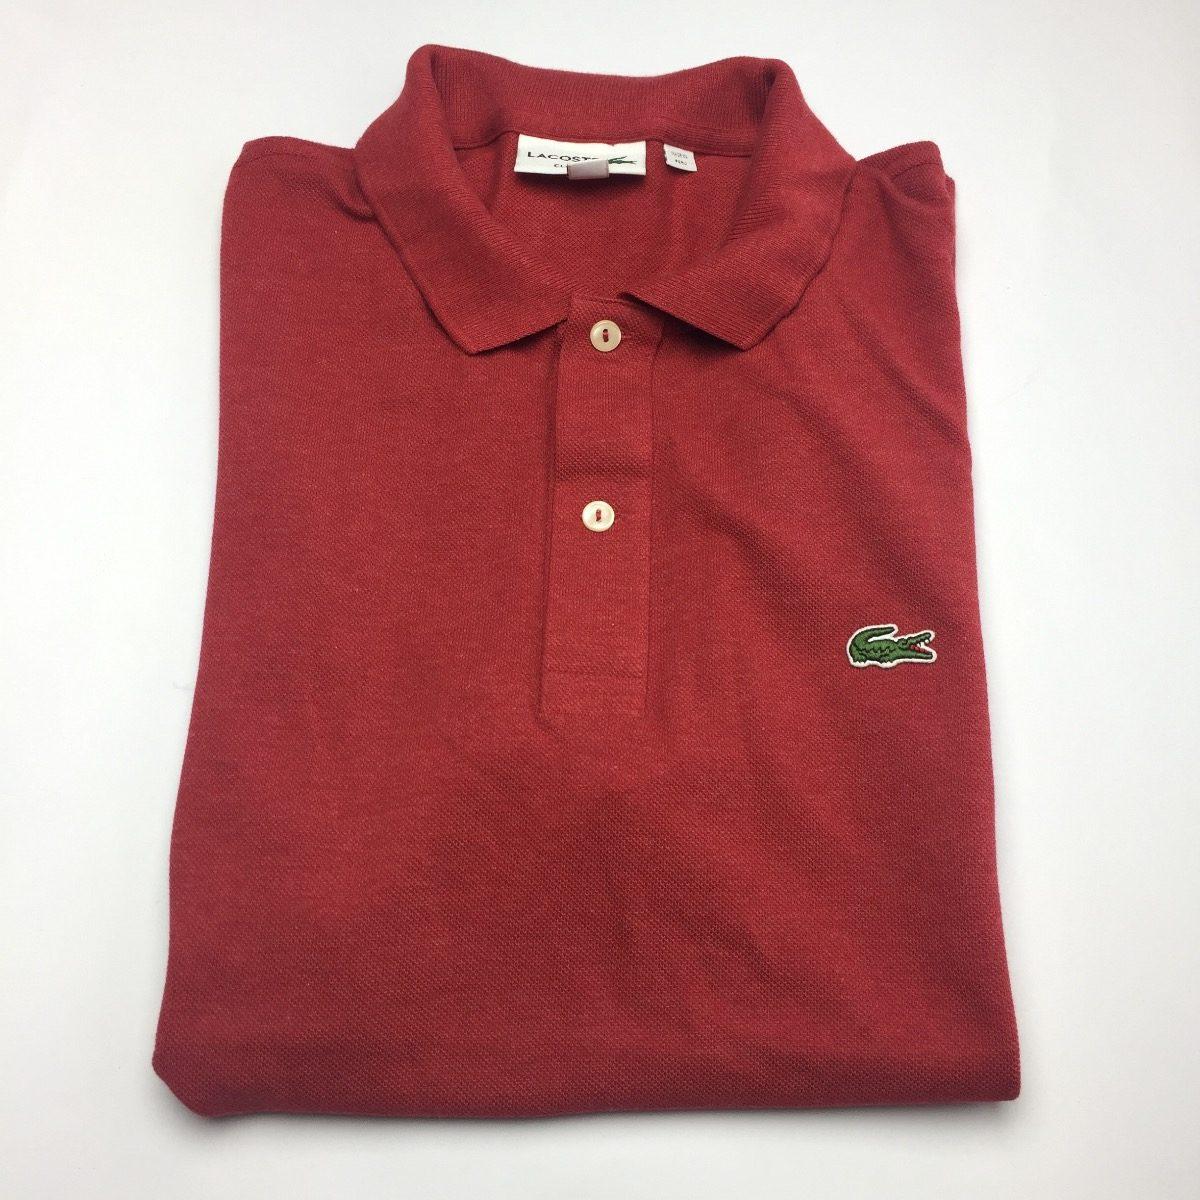 camiseta tipo polo original hombre lacoste talla 4 (m) jersy. Cargando zoom. 812a0d557b